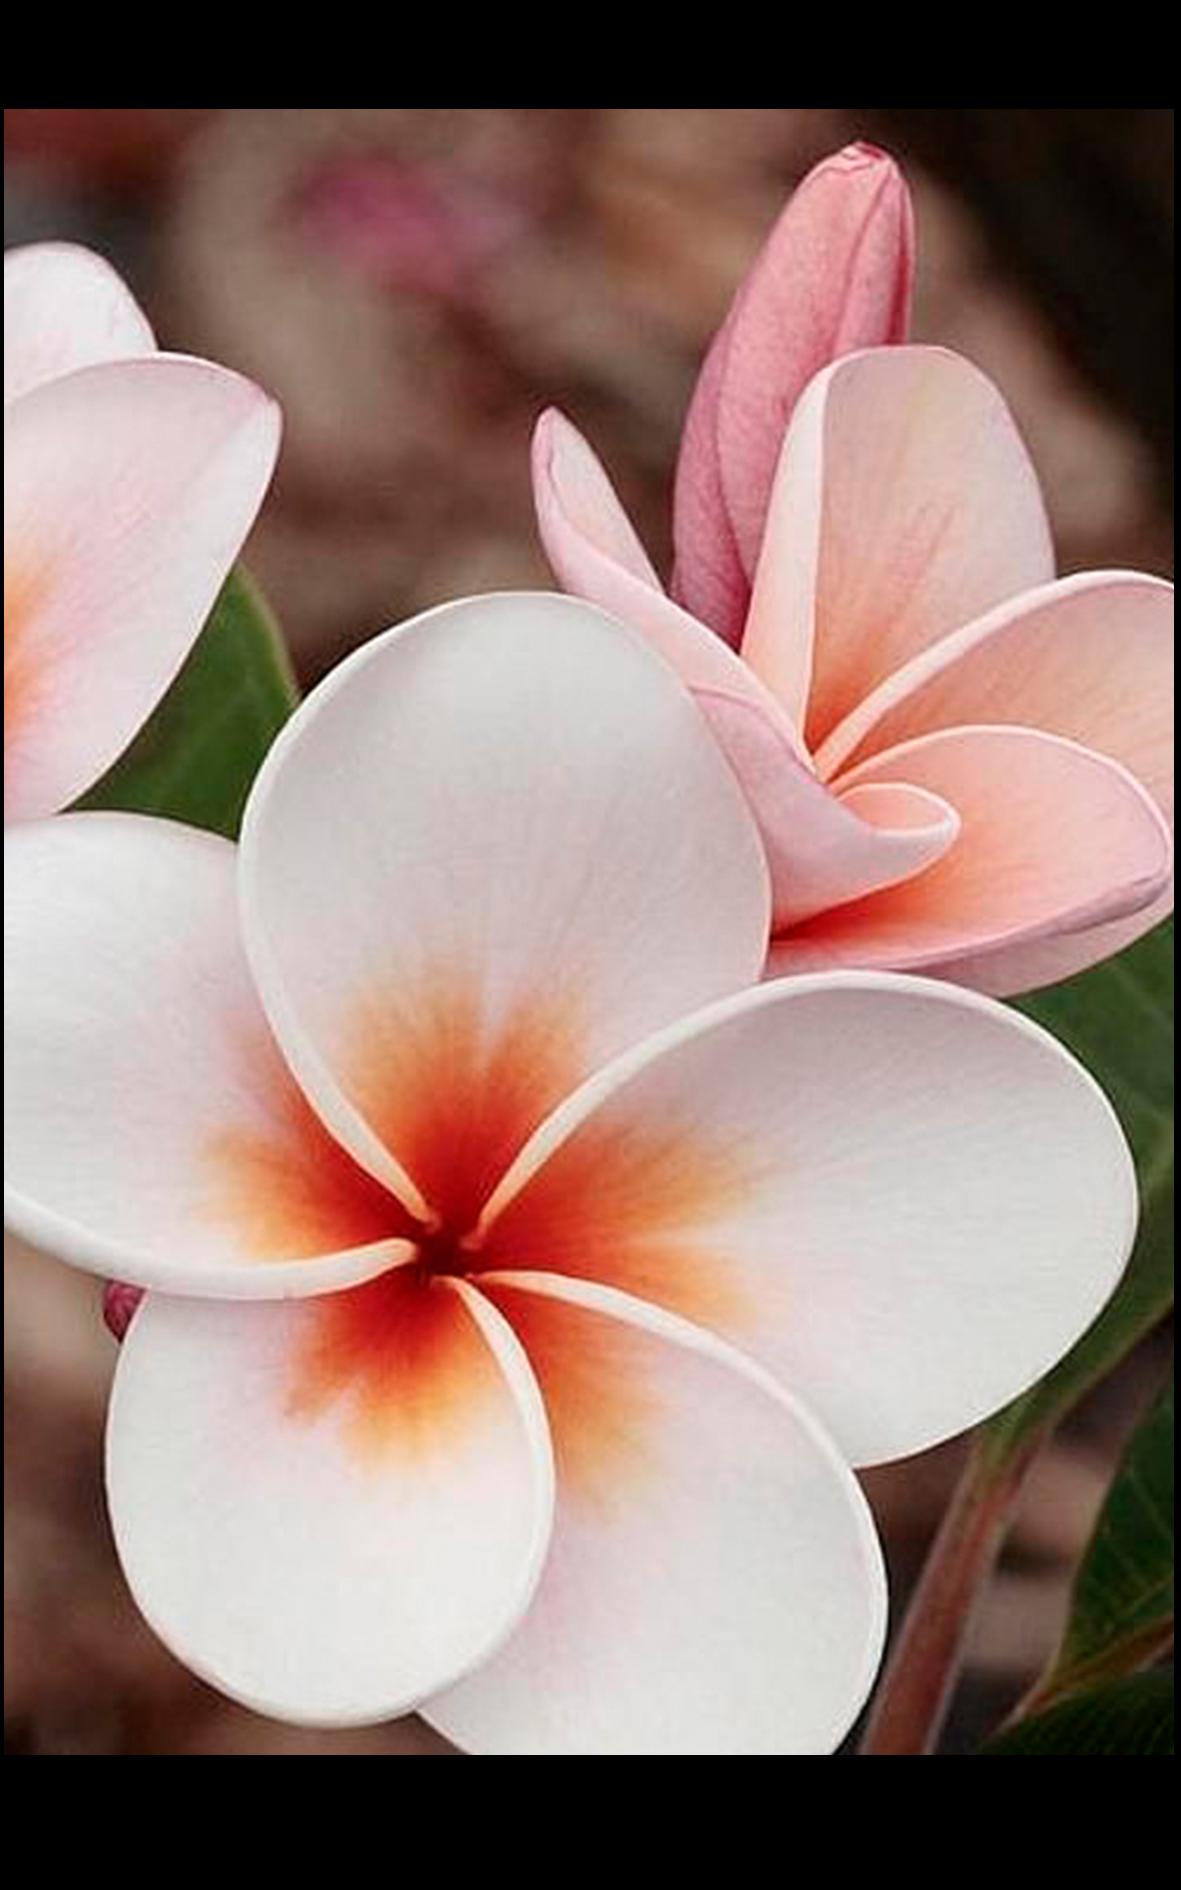 Champa is the national flower of nicaragua and laos champa is the national flower of nicaragua and laos whereflowersbloom izmirmasajfo